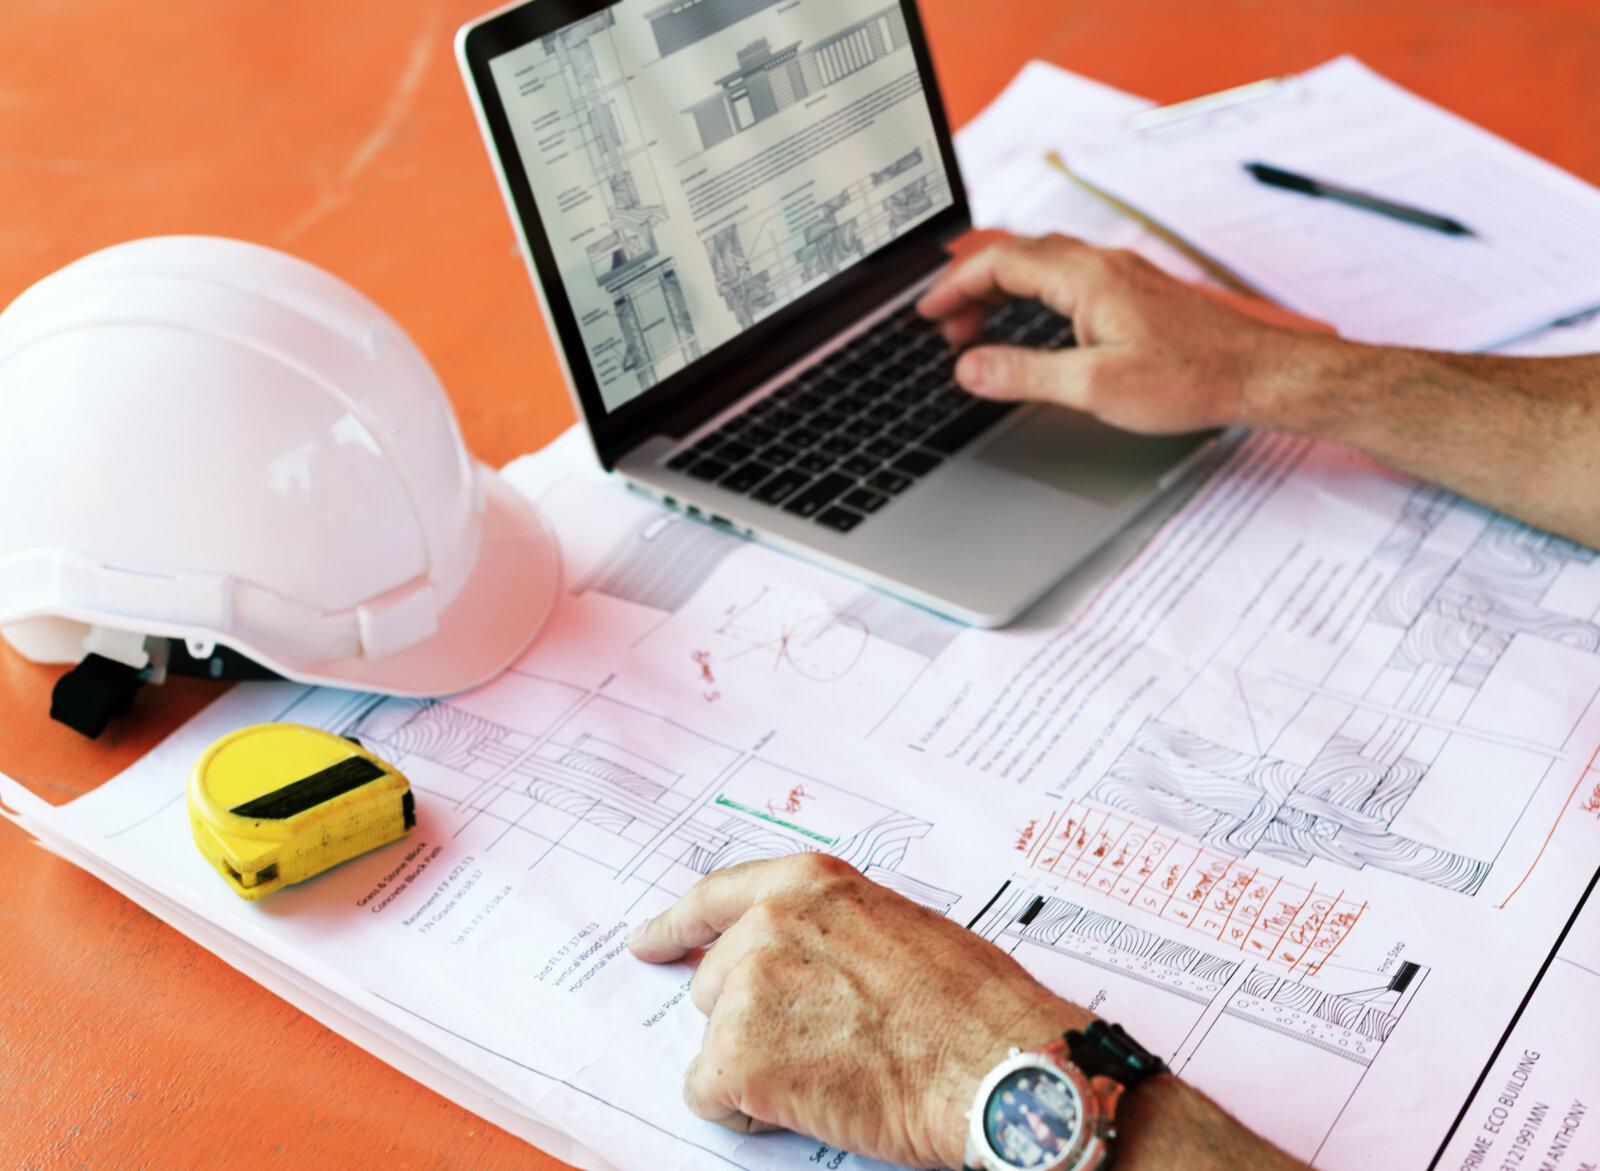 blueprint-architect-career-structure-construction-concept